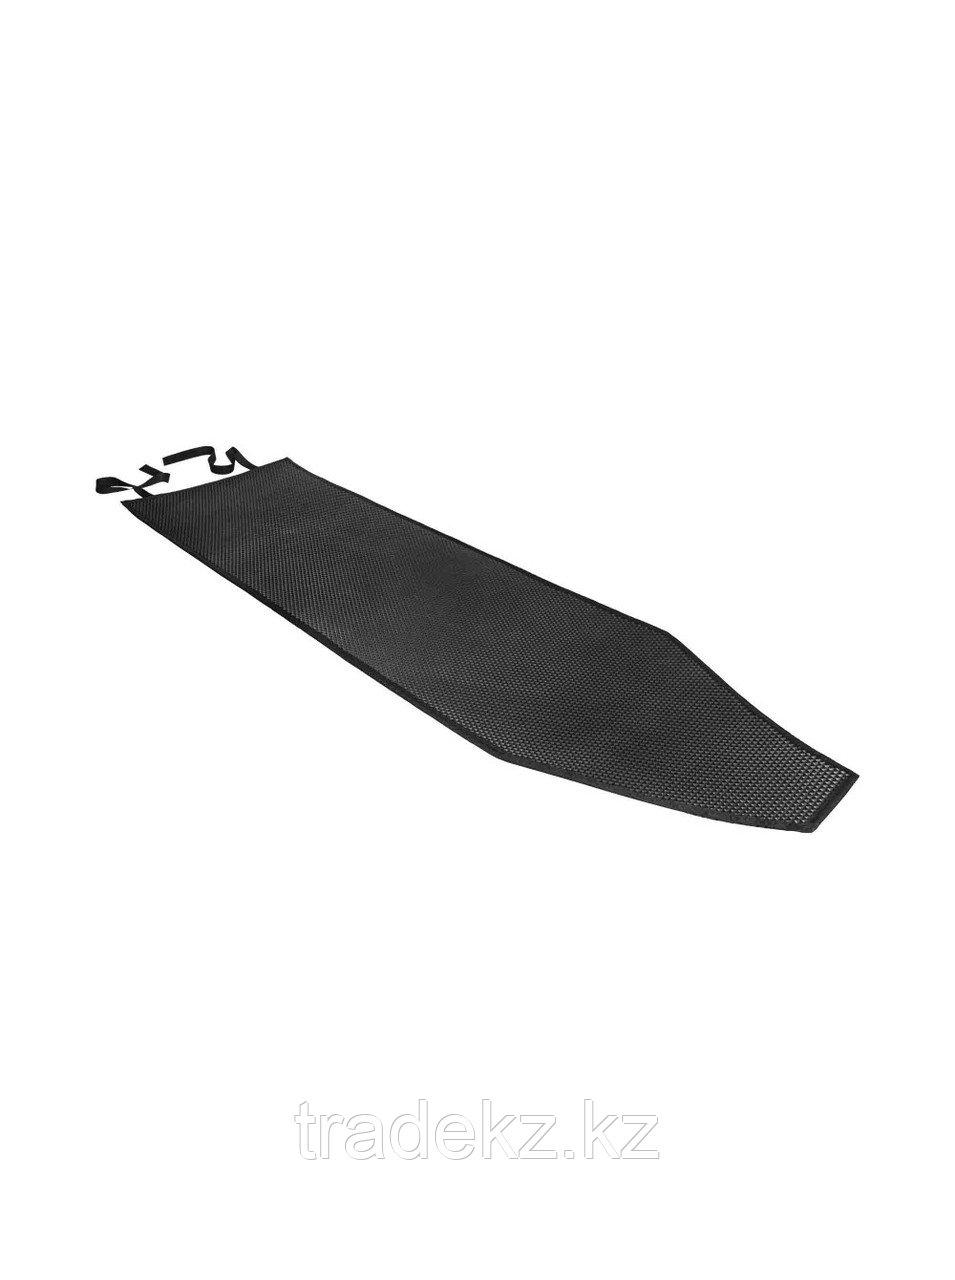 Коврик ЭВА EVA Proff по форме дна для лодки АПАЧИ 3300 СК (APACHE 3300 СК)